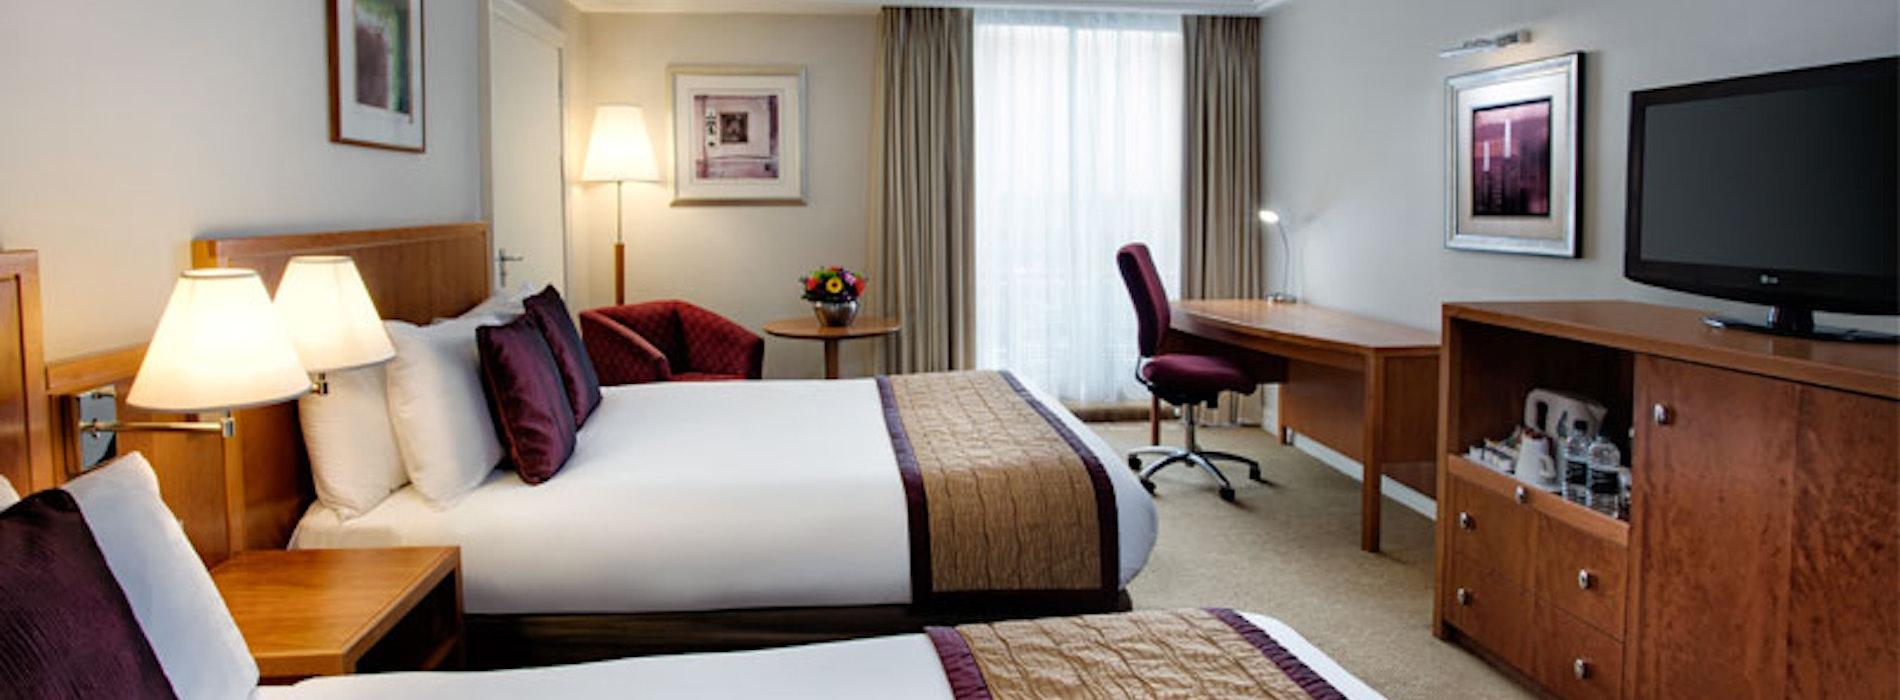 Crowne Plaza Heathrow Hotel near LEGOLAND Windsor Resort